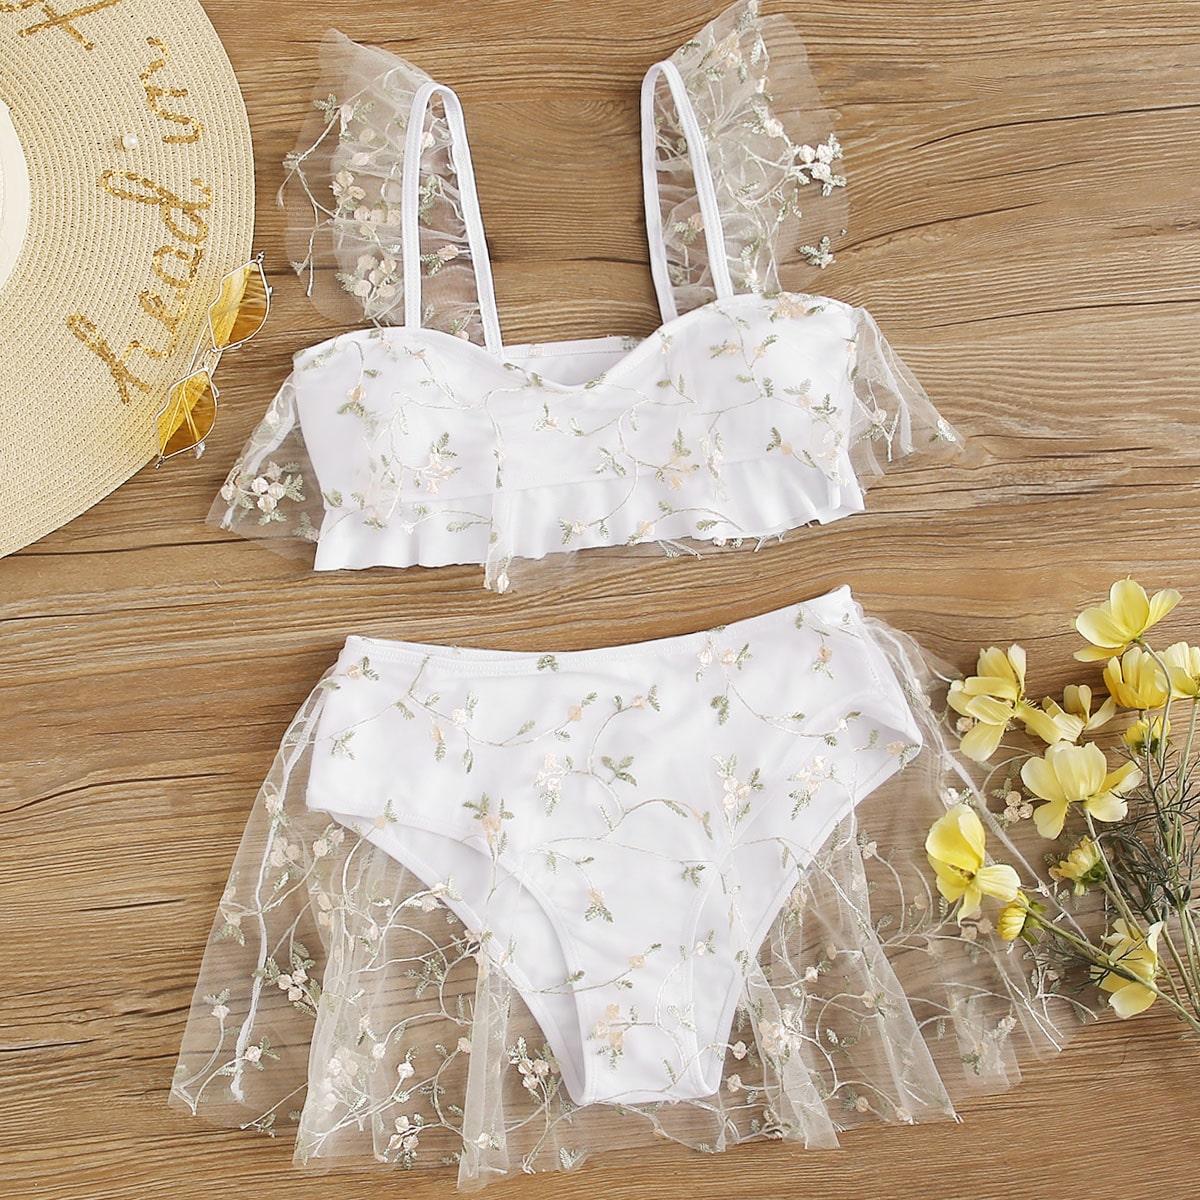 SHEIN / Floral Embroidered Mesh Bikini Swimsuit